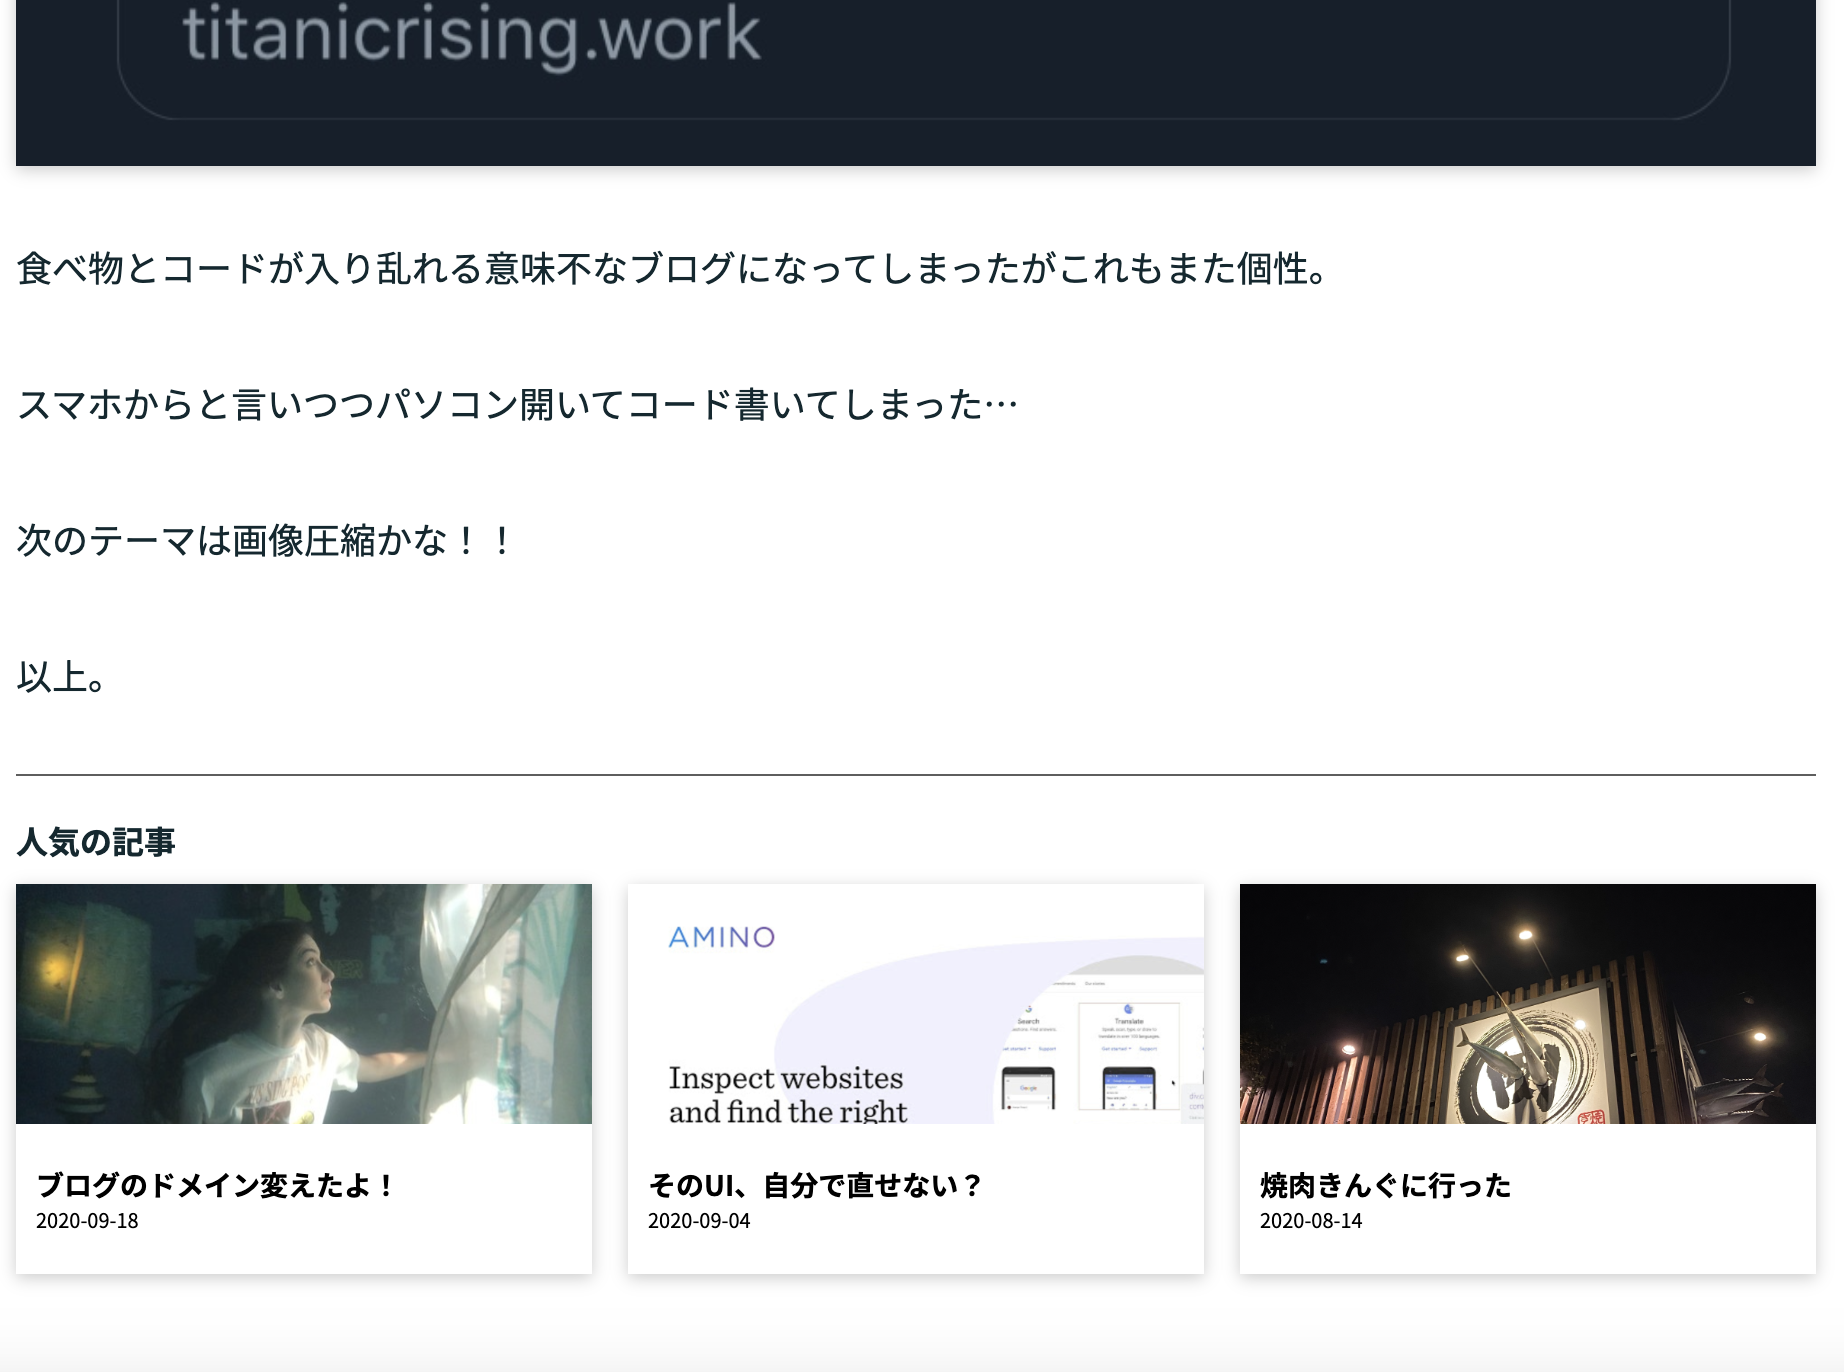 https://res.cloudinary.com/dw86z2fnr/image/upload/v1620383434/titanicrising.jp/popular-article/_2020-09-19_13.09.39_yqoi0z.png